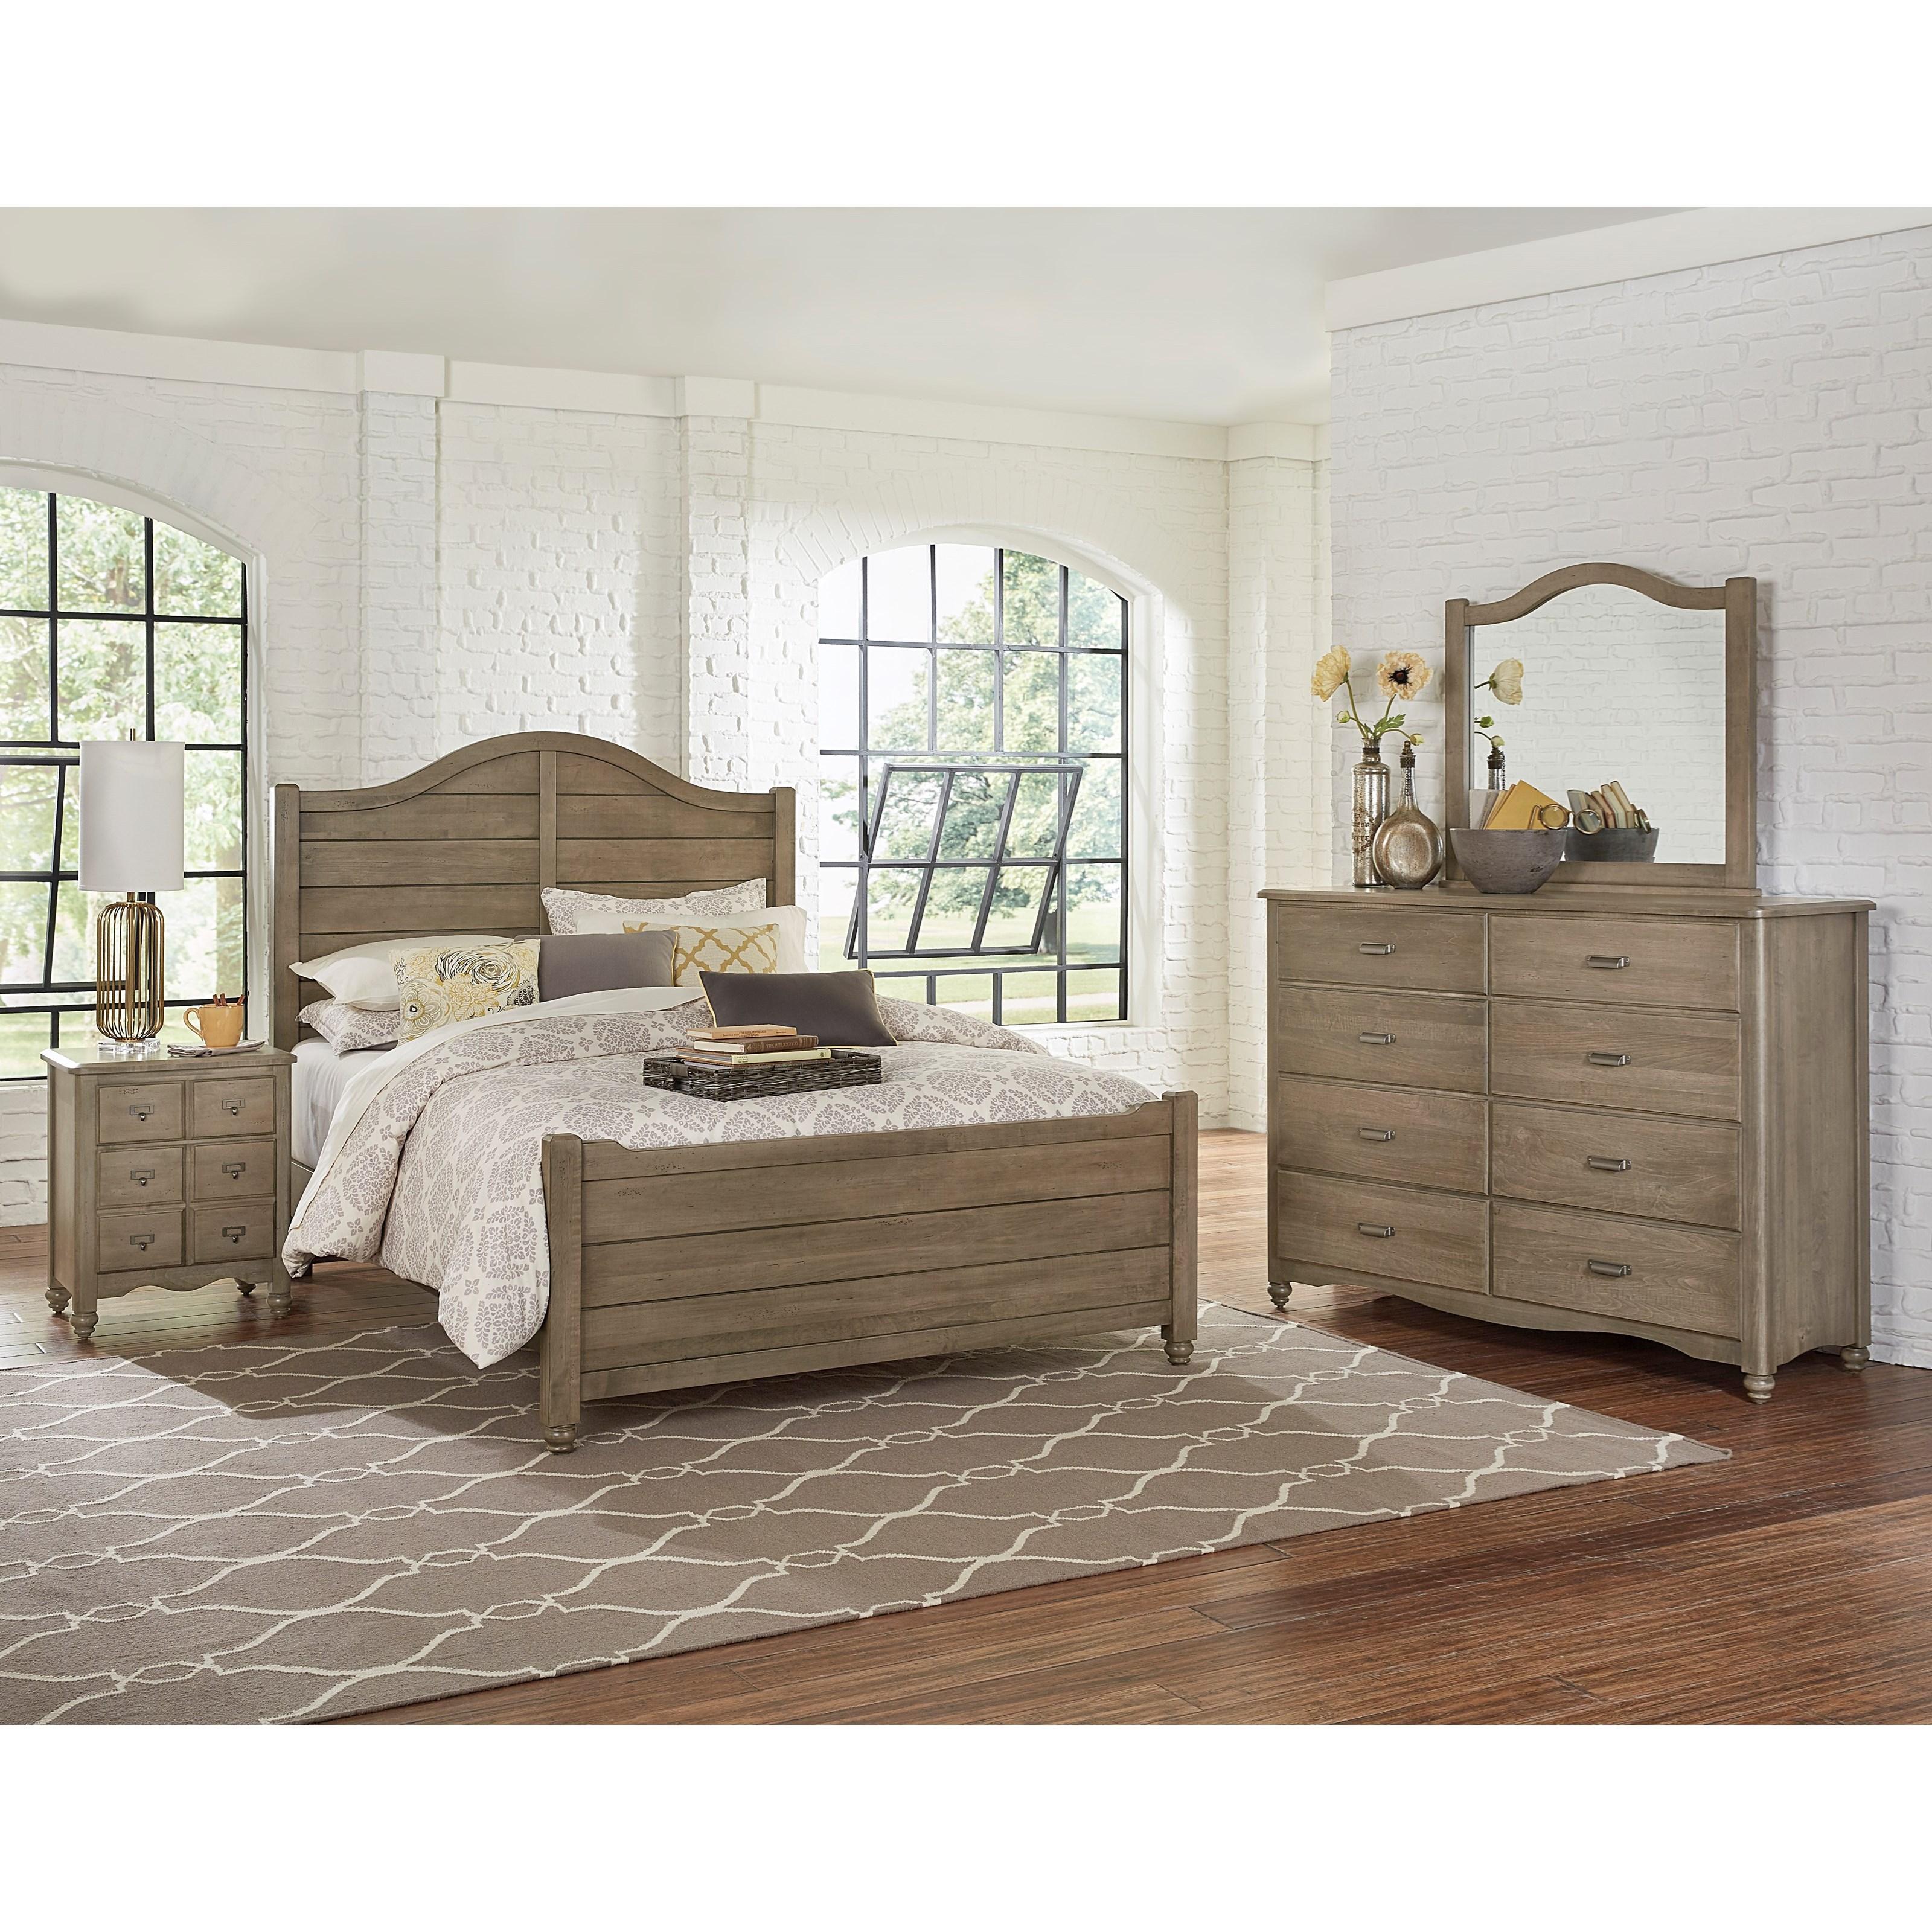 Vaughan Bassett American Maple Full Bedroom Group - Item Number: 401 F Bedroom Group 2